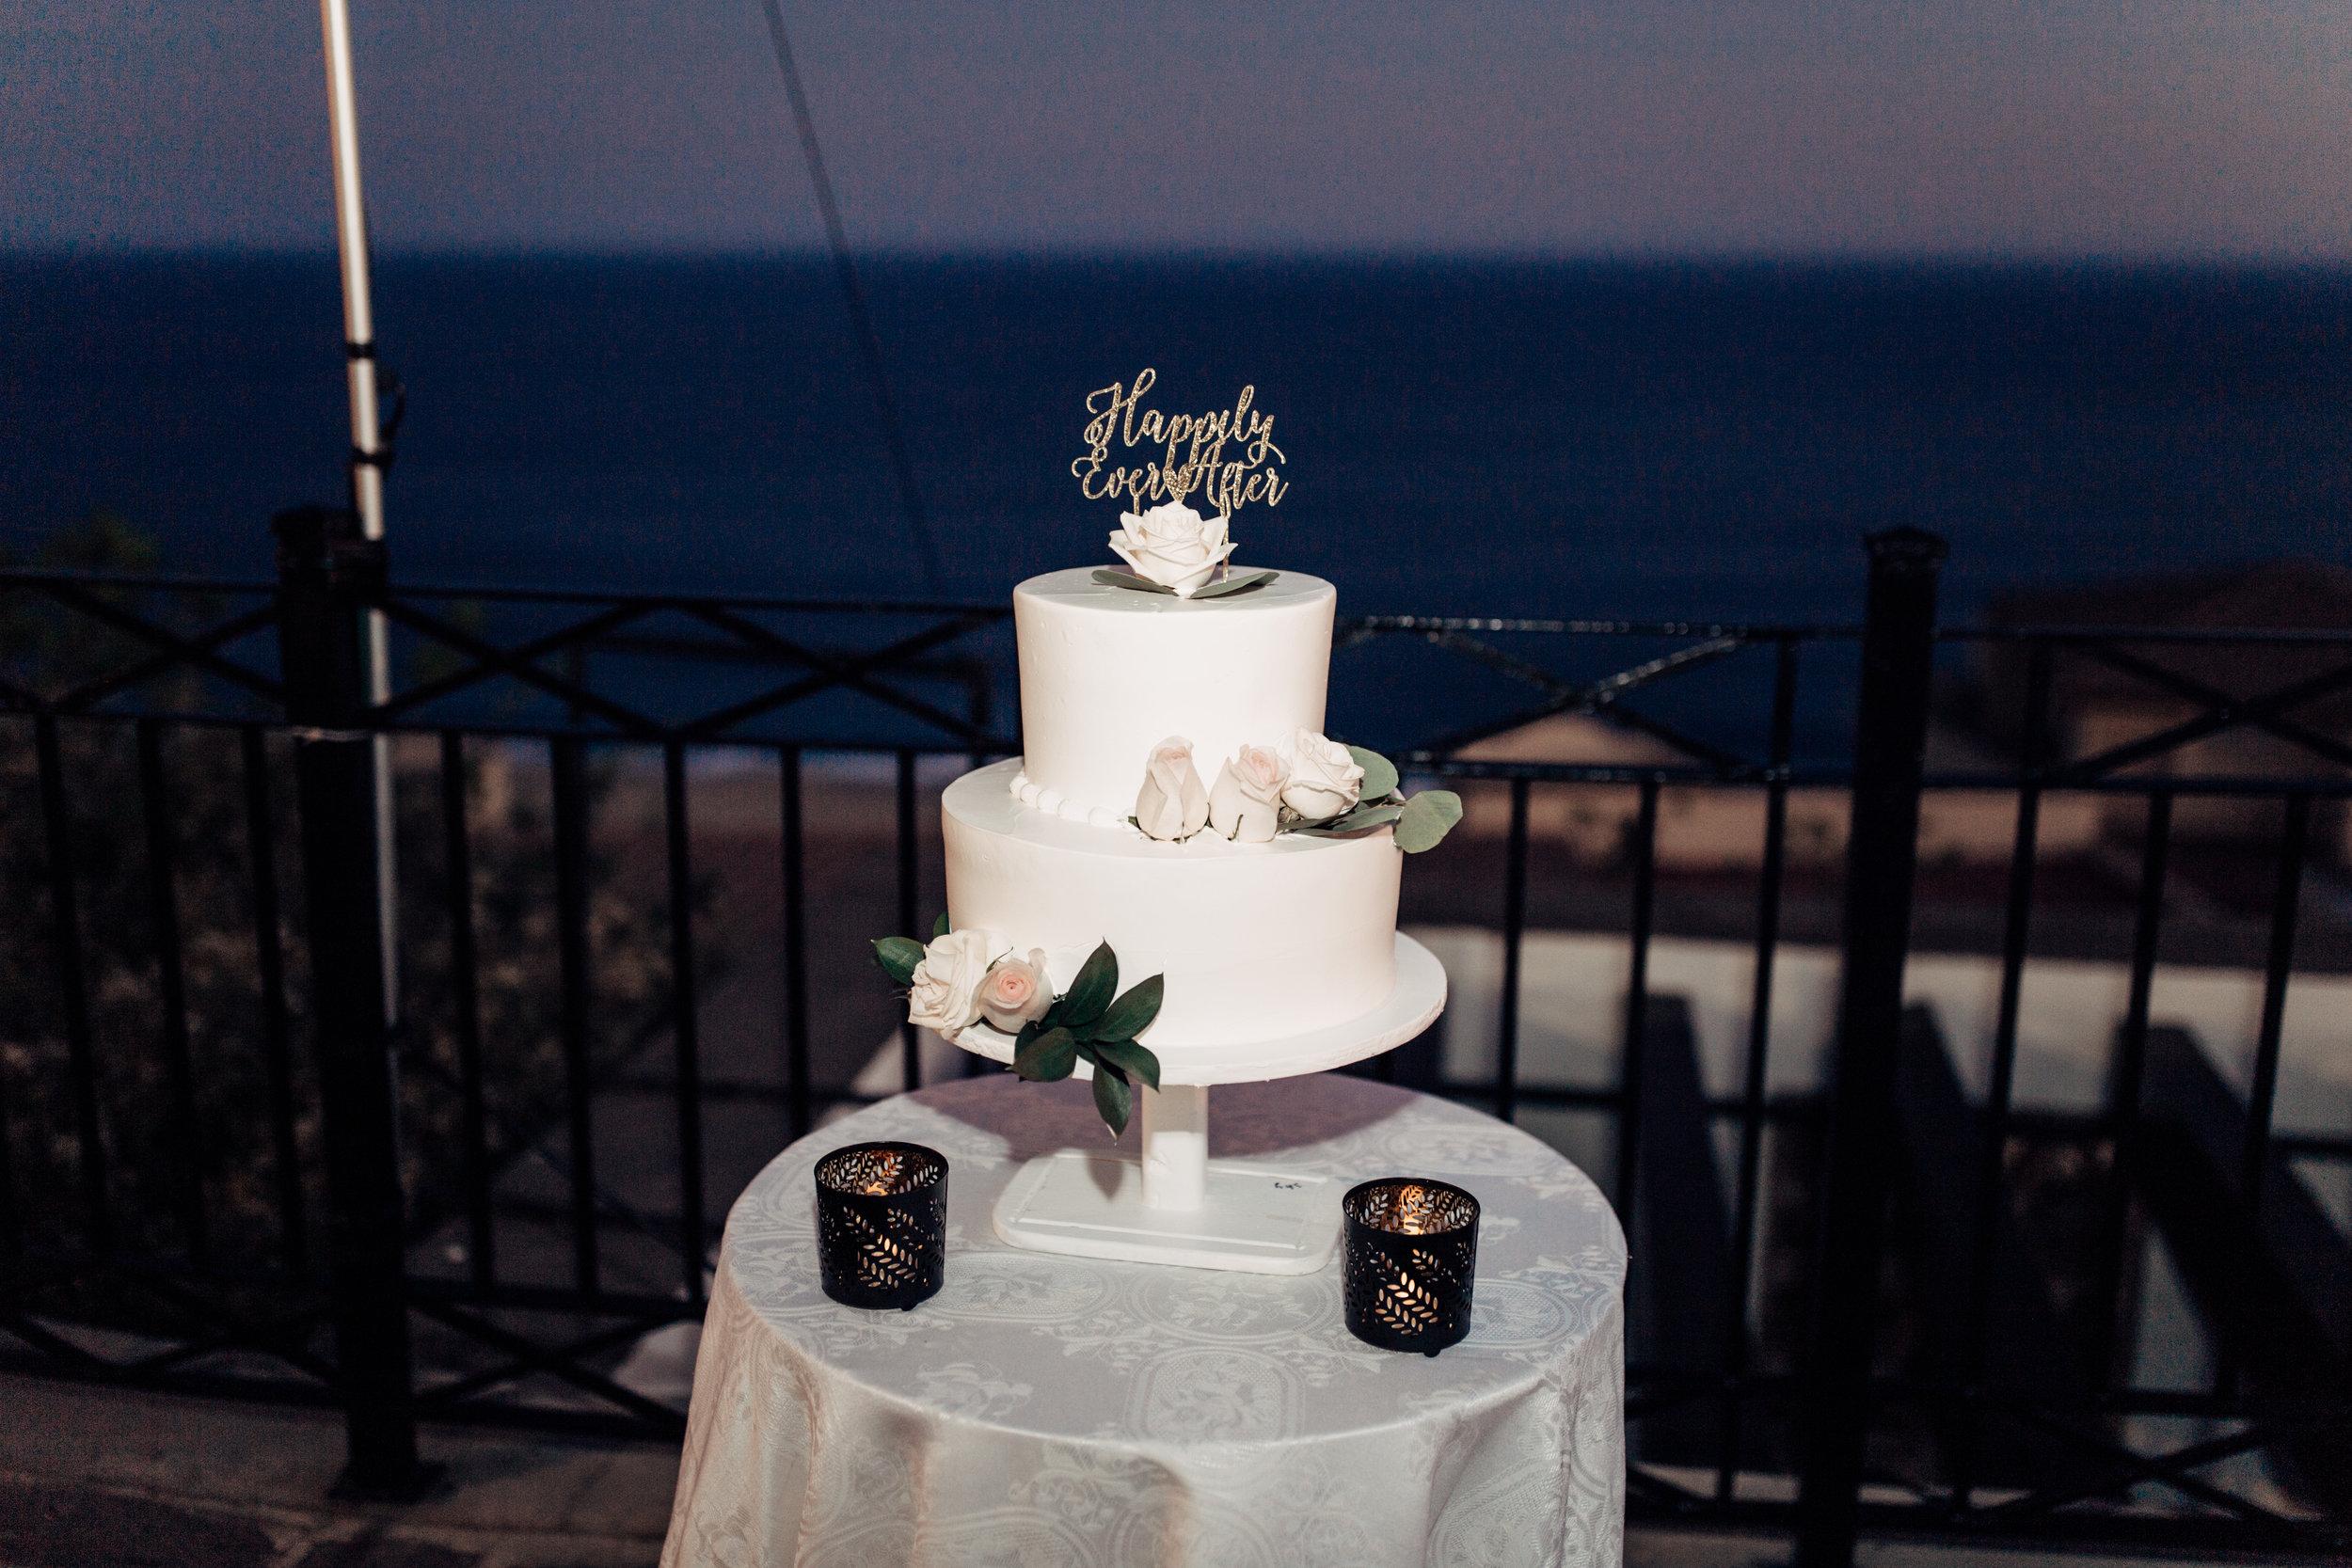 pueblo-bonito-sunset-beach-wedding-cabo-san-lucas635.jpg